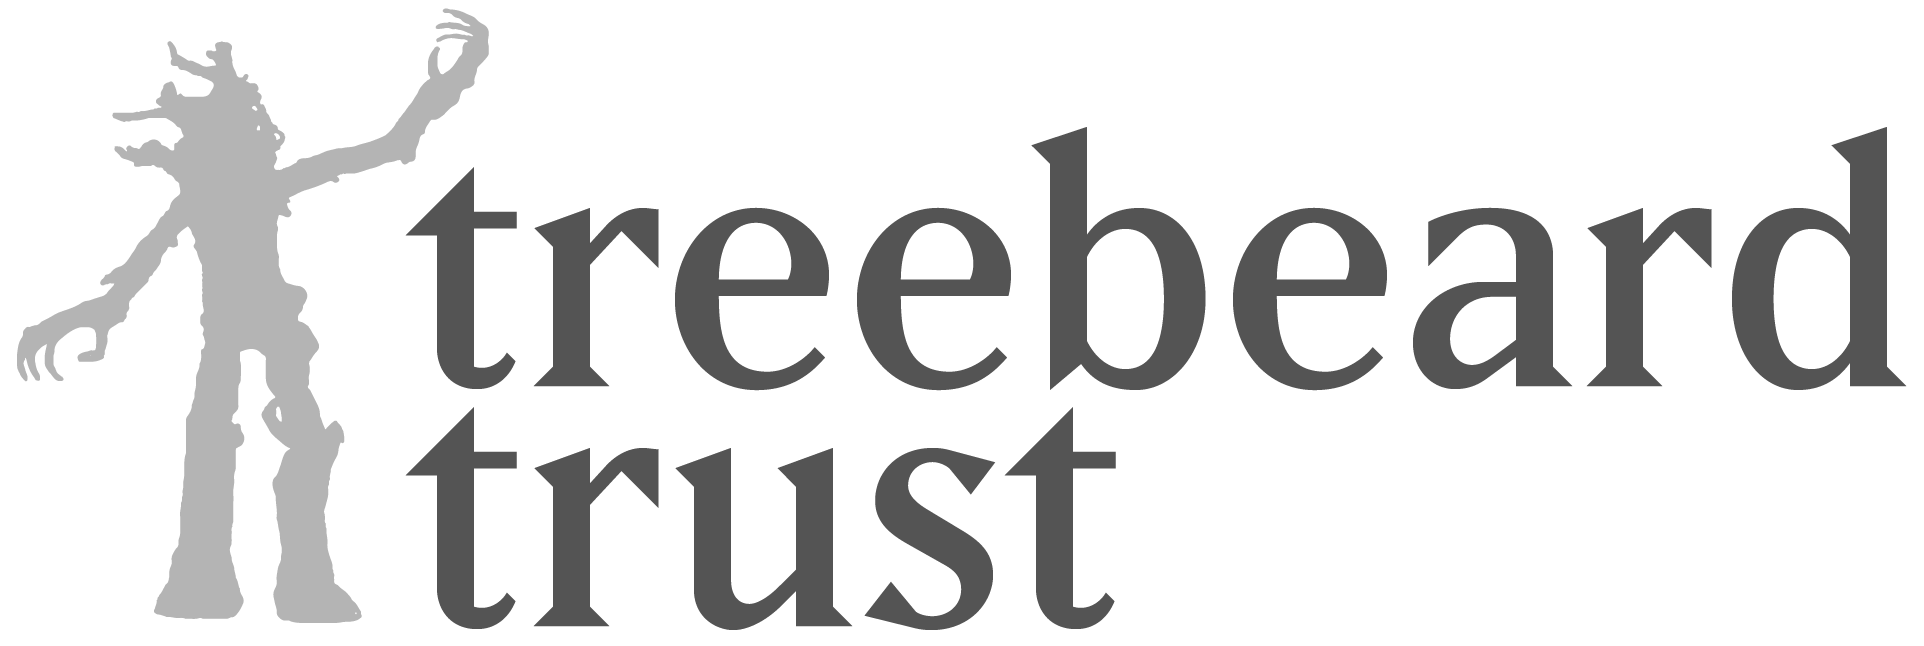 Treebeard_logo_final-01